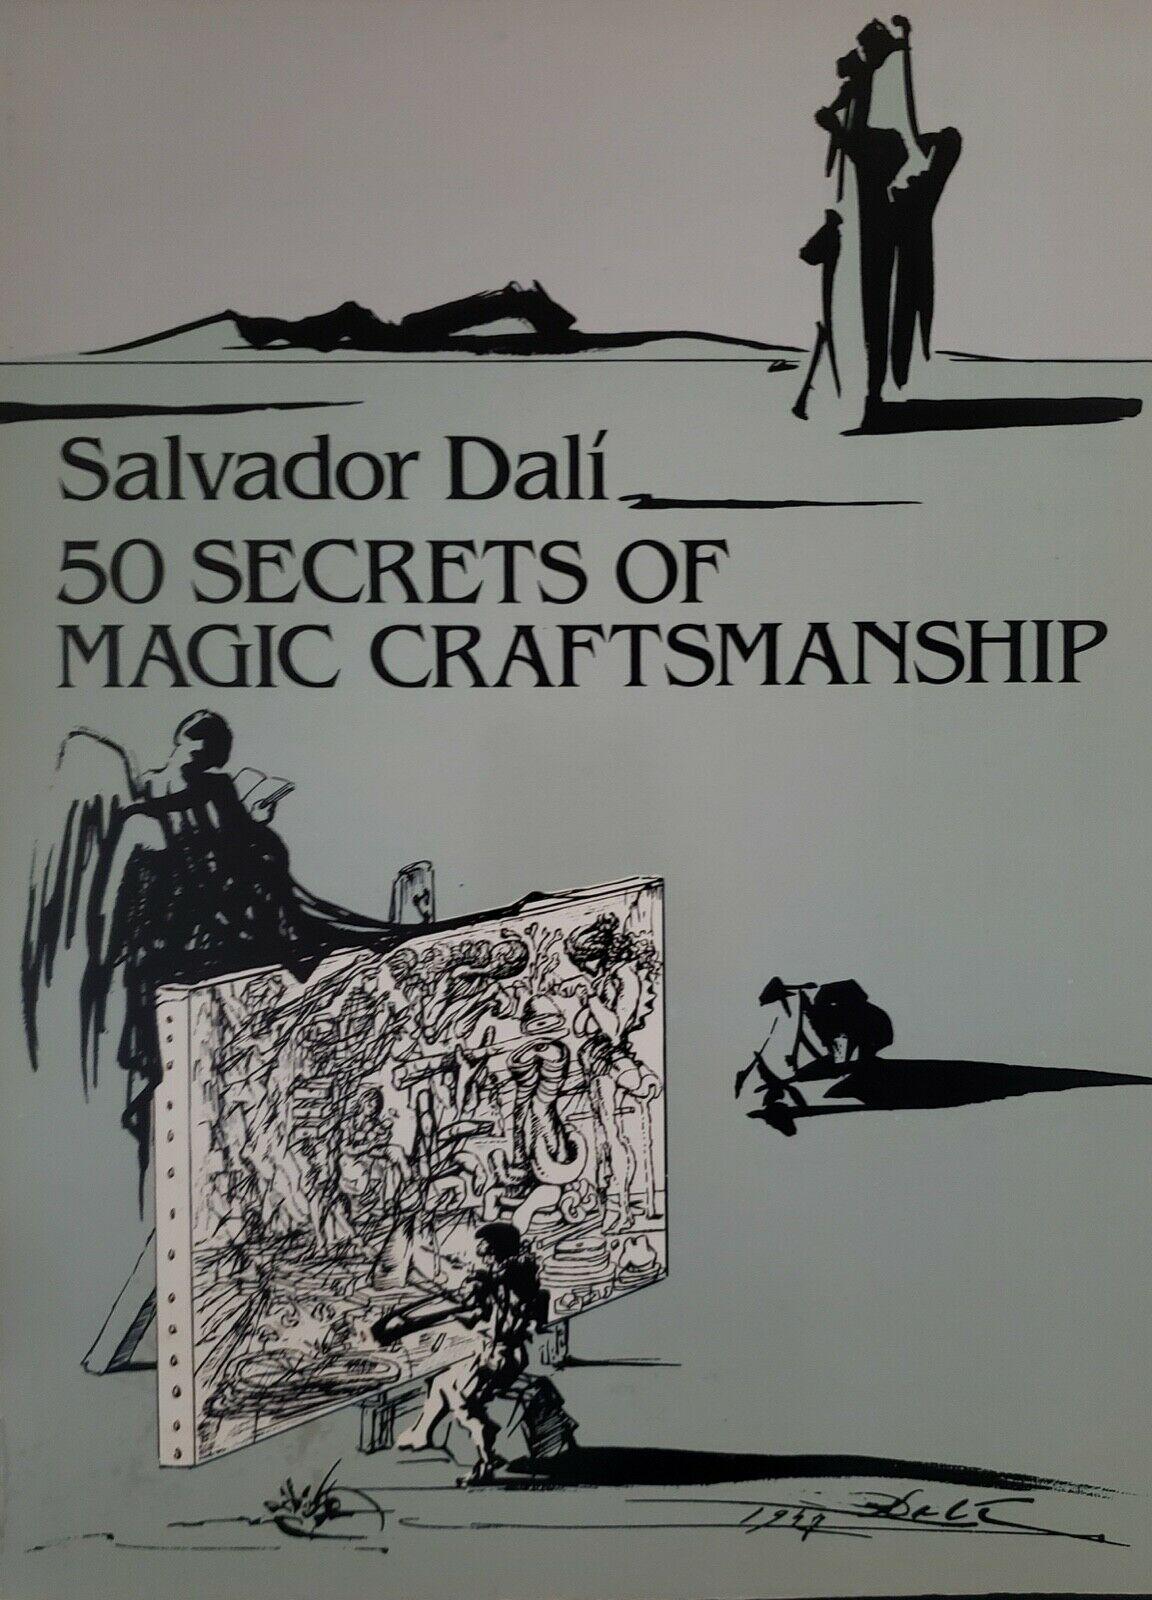 Salvador Dalí 50 Secrets of Magic Craftsmanship 1948 Reproduction Surrealism Art